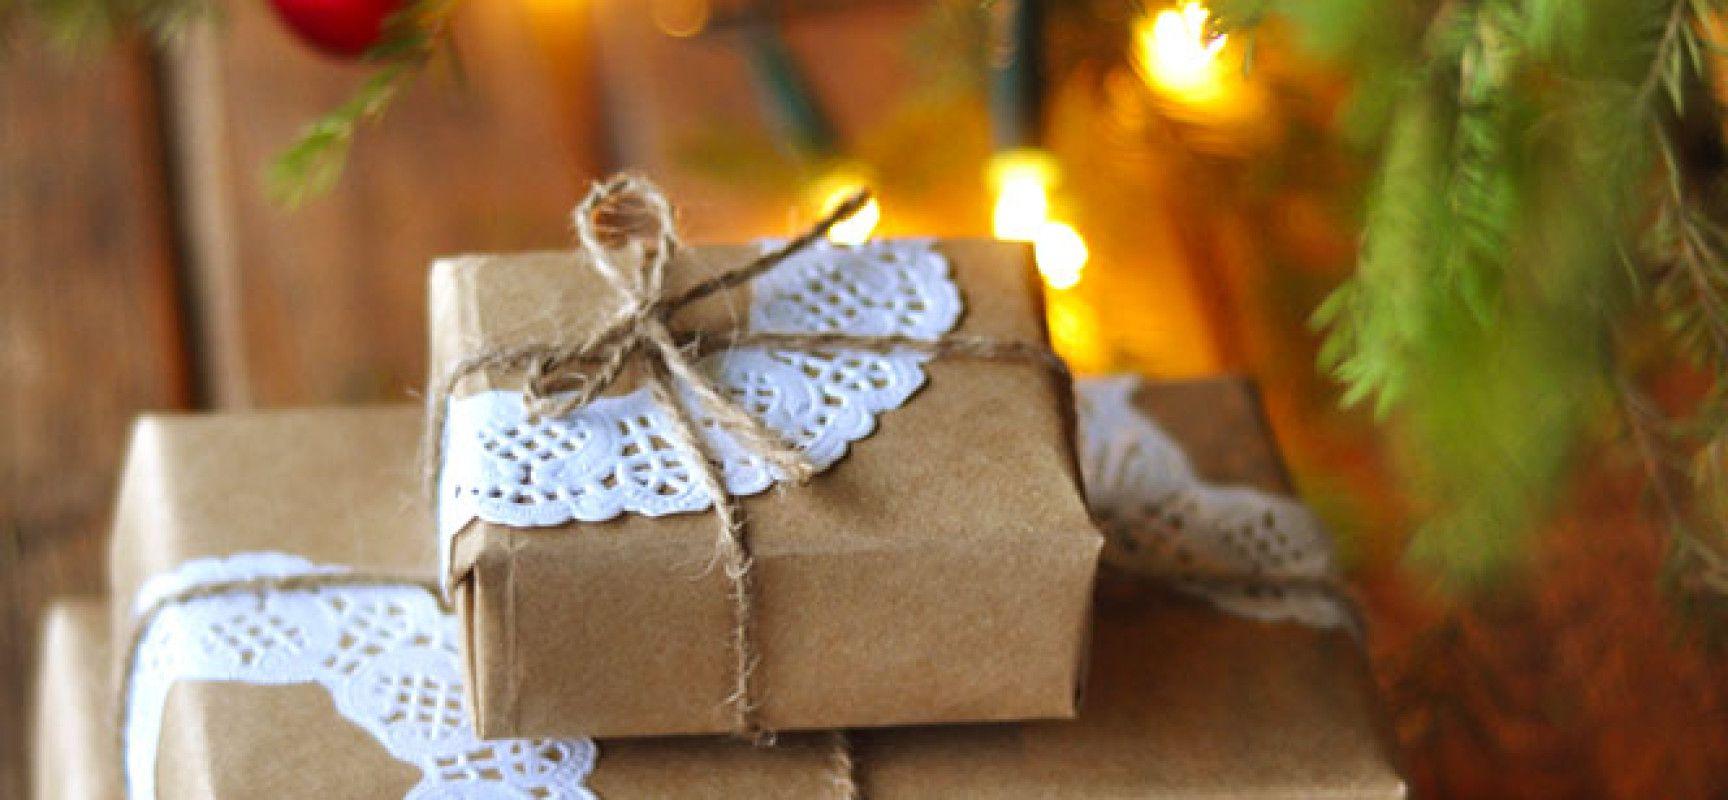 Best Christmas Gift Ideas for Parents | Entertainment | Pinterest